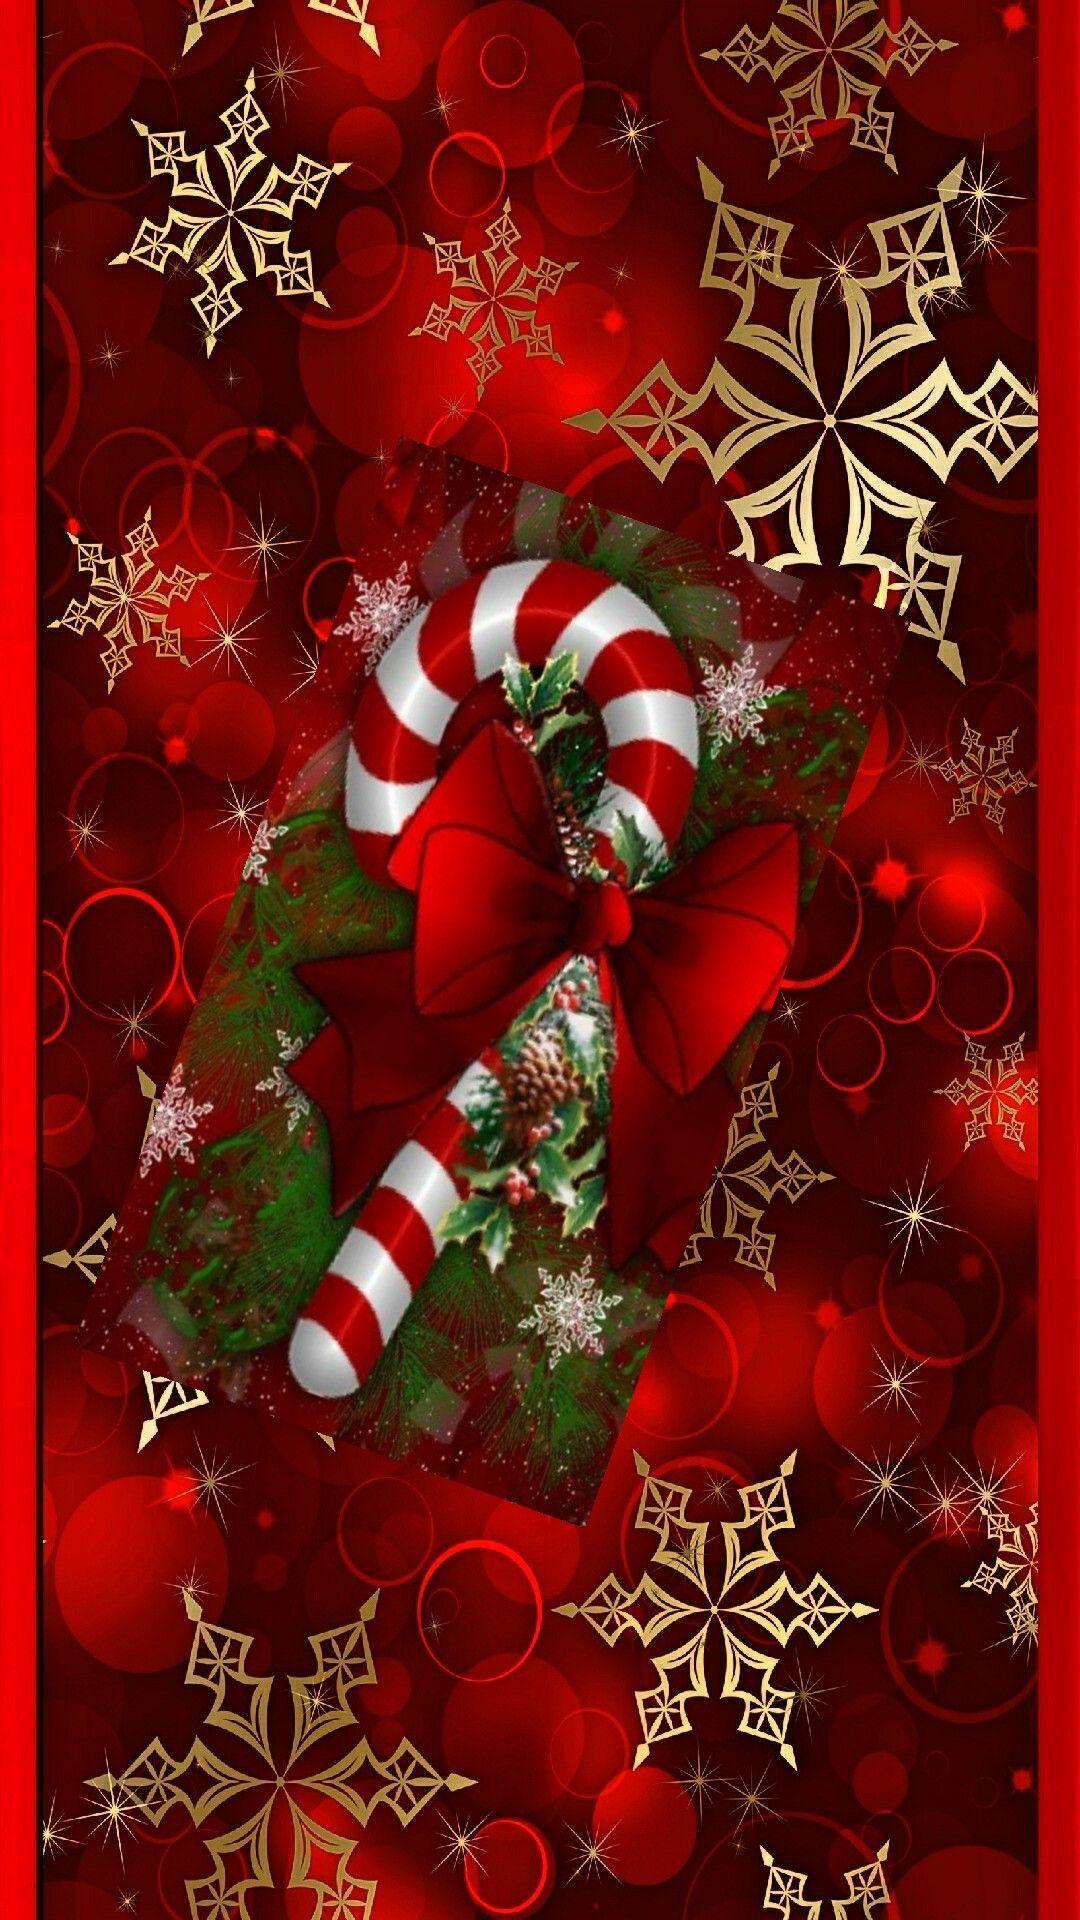 Besinnliche Weihnachtsbilder.Christmas Candy Cane Printables Xmas Wallpaper Christmas